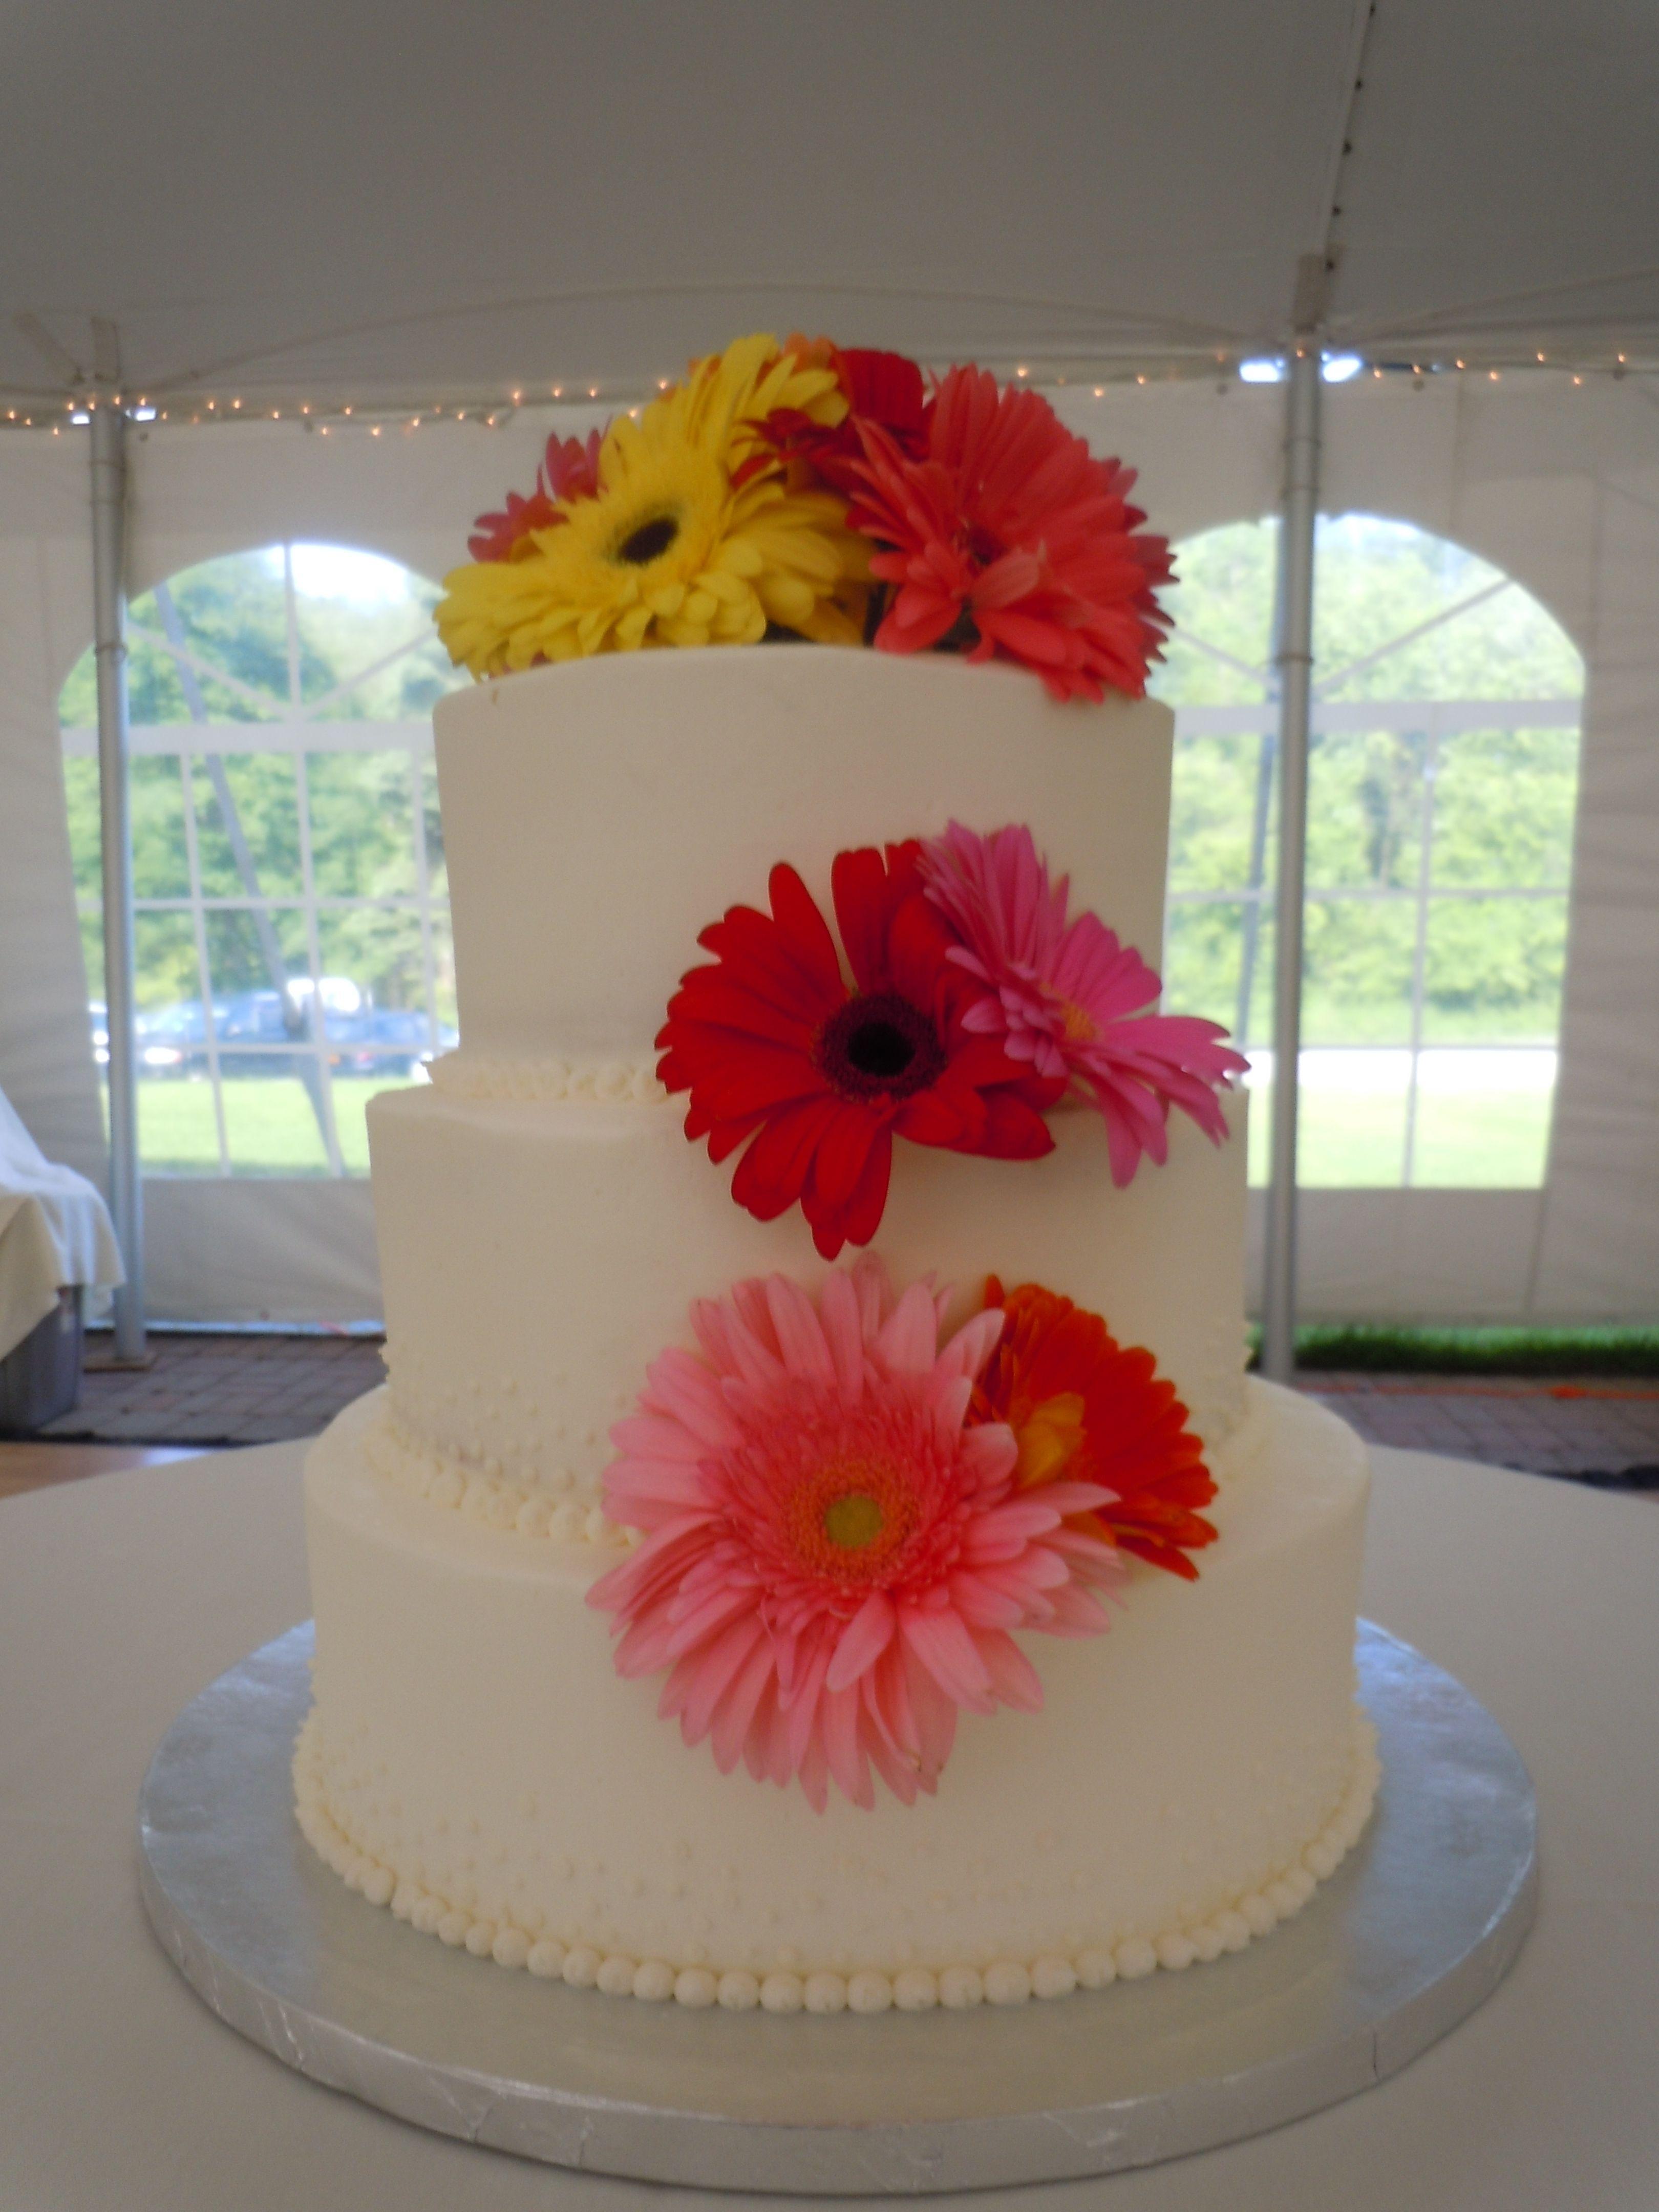 Gerber Daisies Wedding Cake Ideas and Designs